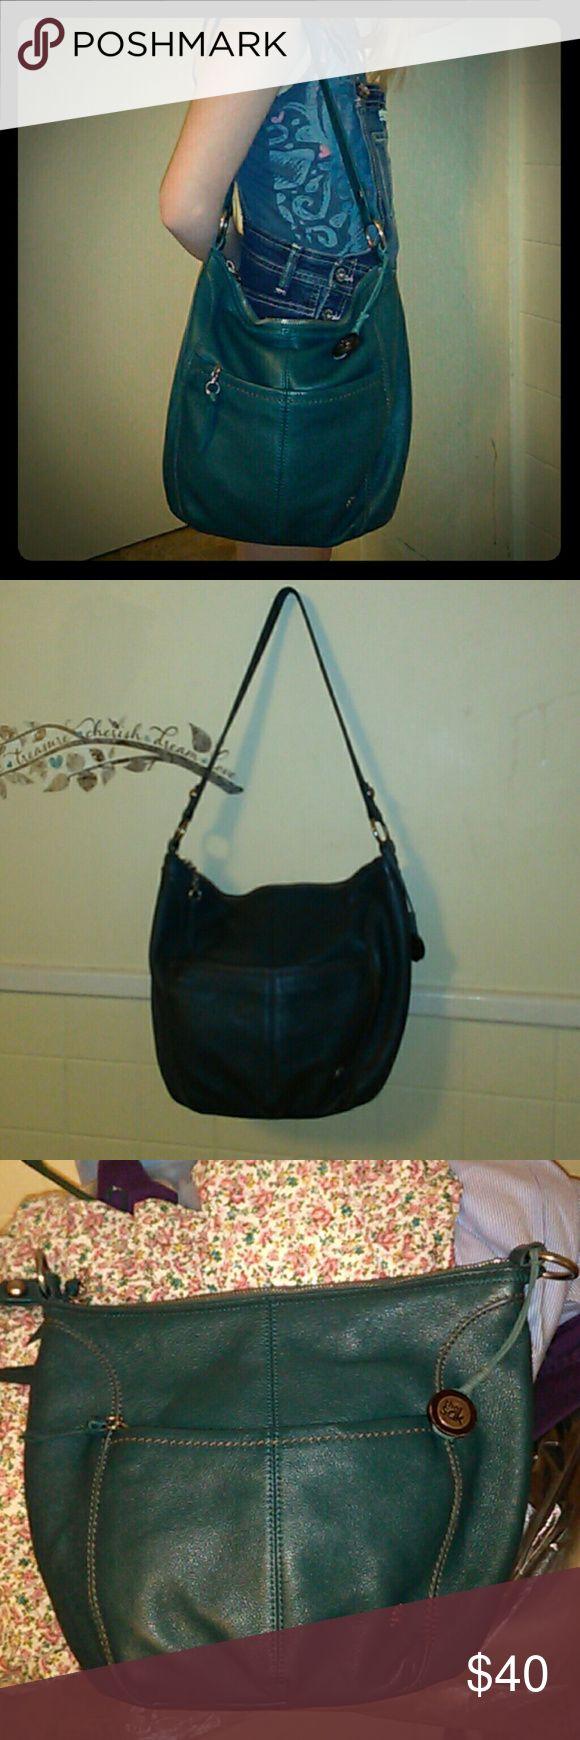 The Sak Olive Green Leather Hobo Handbag The Sak Olive GreenLeather Hobo Handbag. Has zipper pocket on front, small pocket on back &   zipper pocket and 2 pockets on inside. Excellent condition. The Sak Bags Hobos